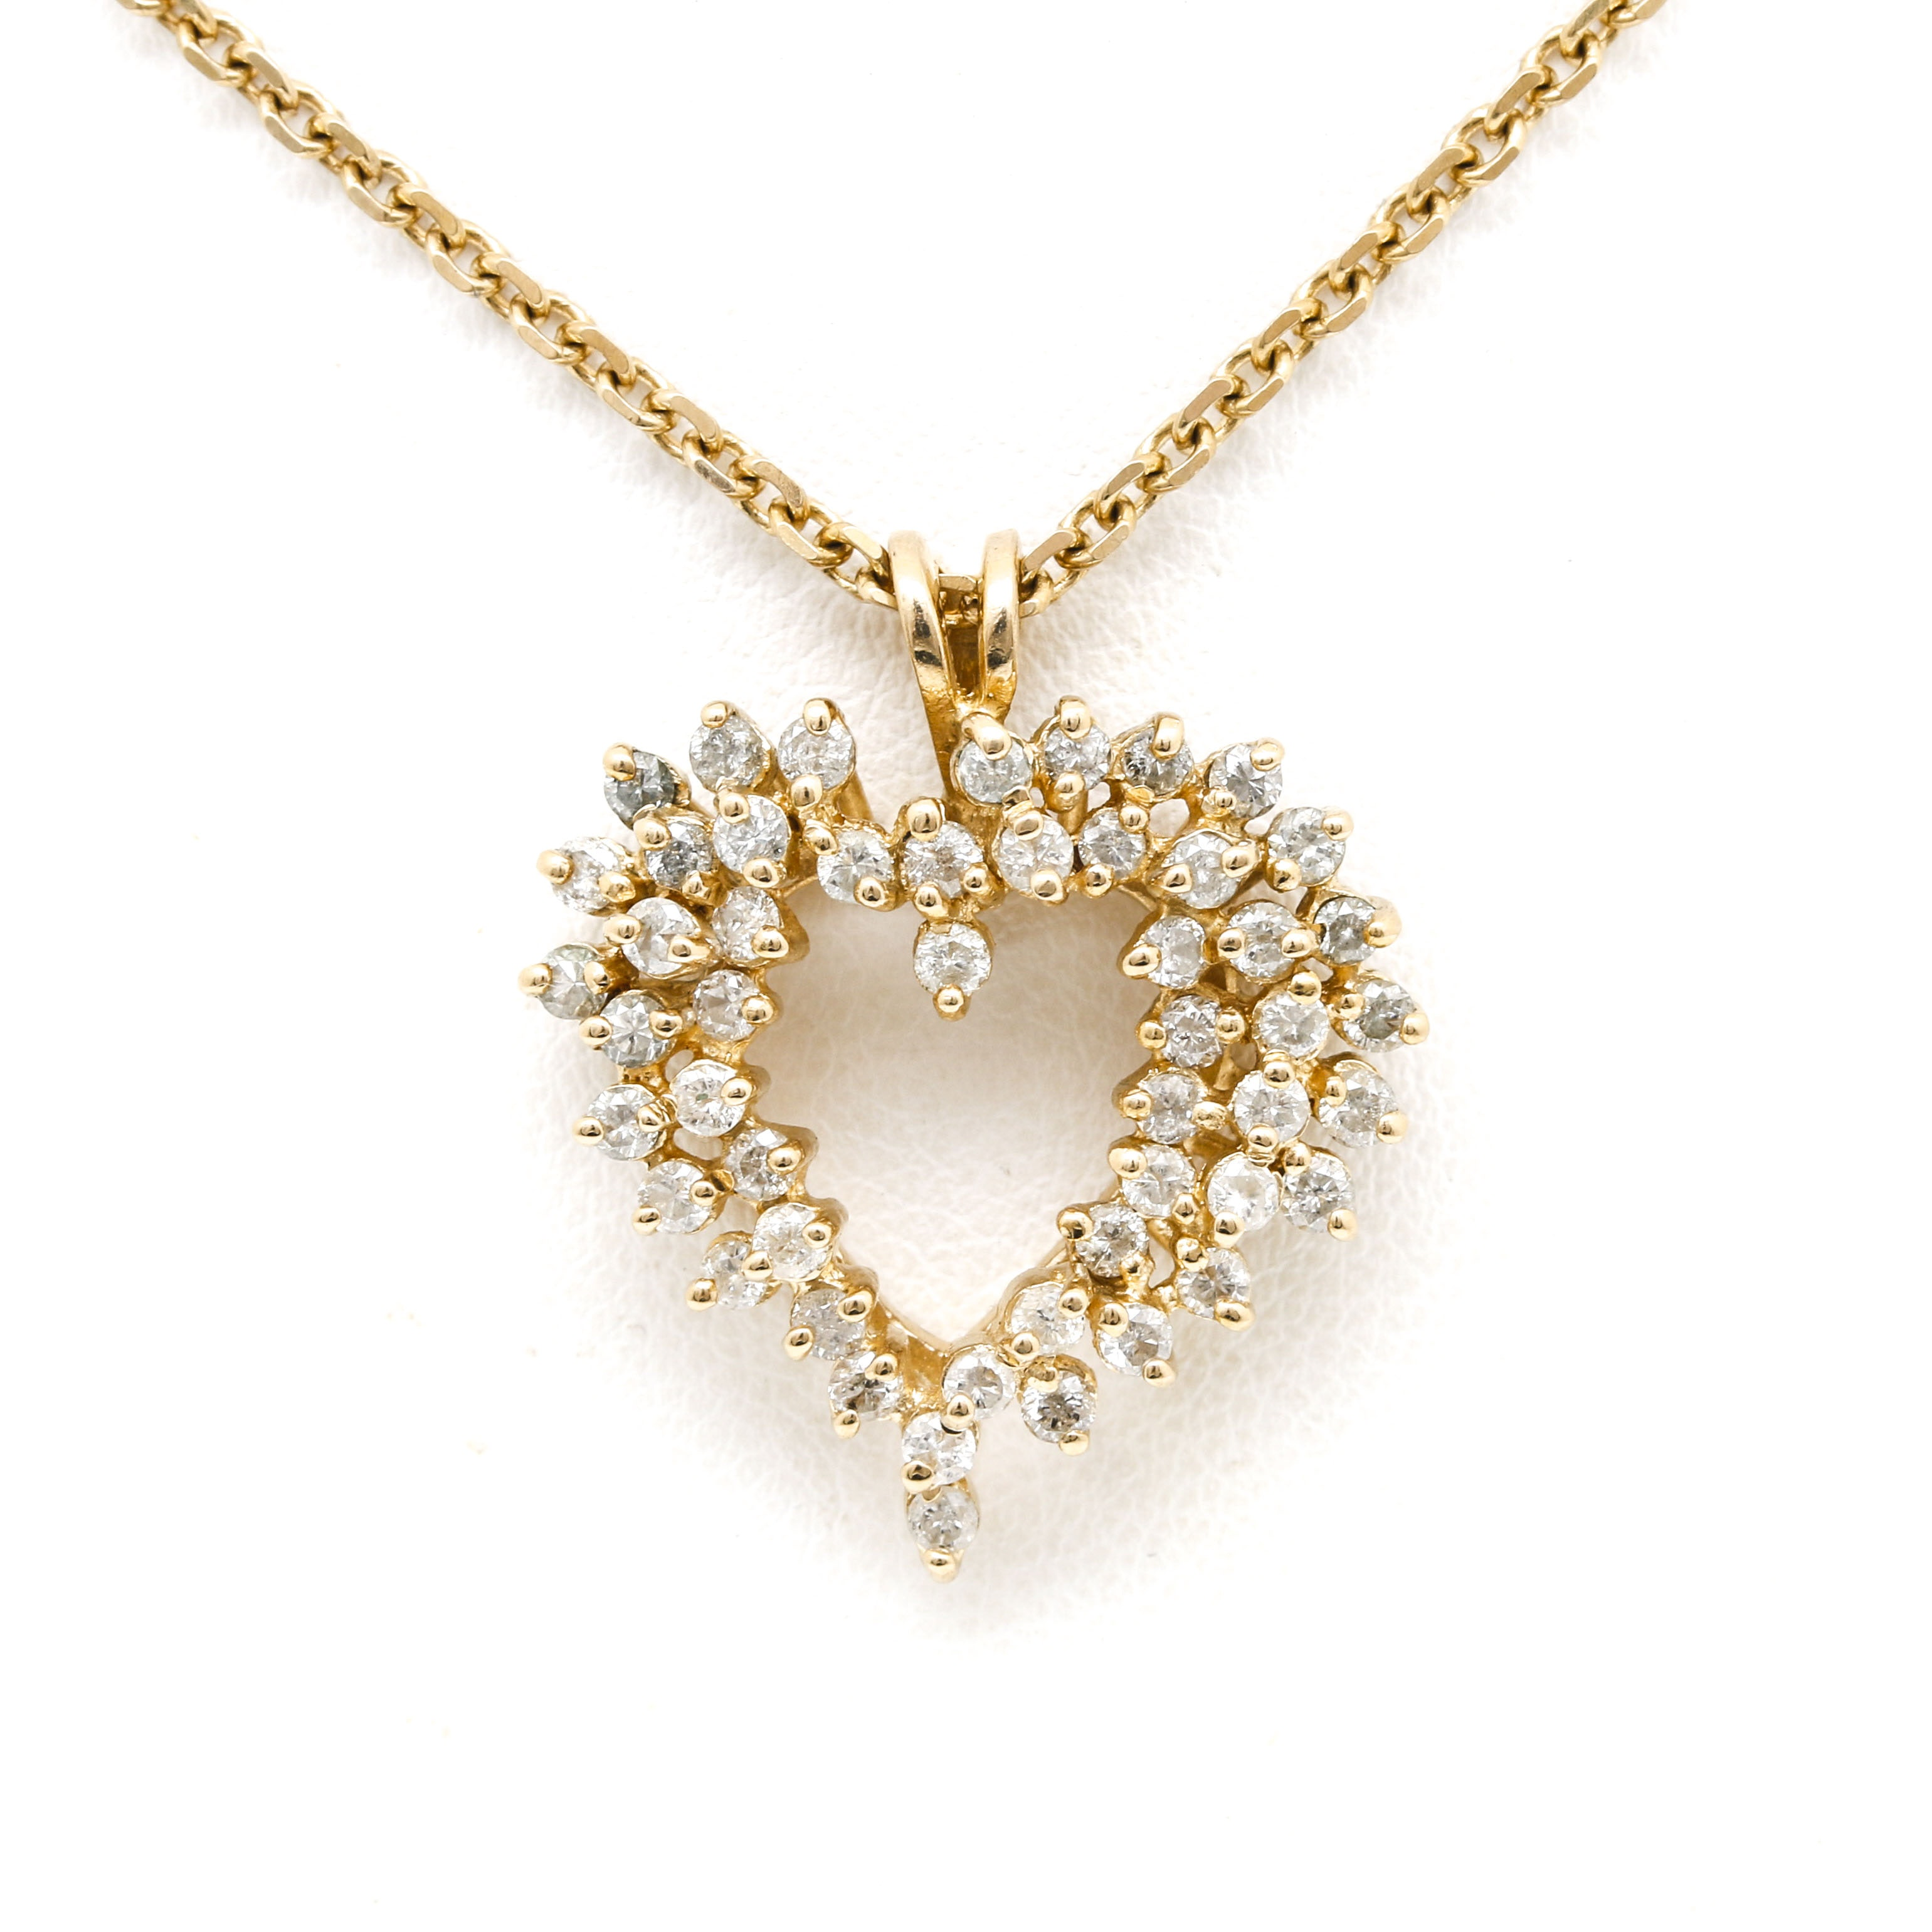 14K Yellow Gold 1.00 CTW Diamond Heart Pendant Necklace